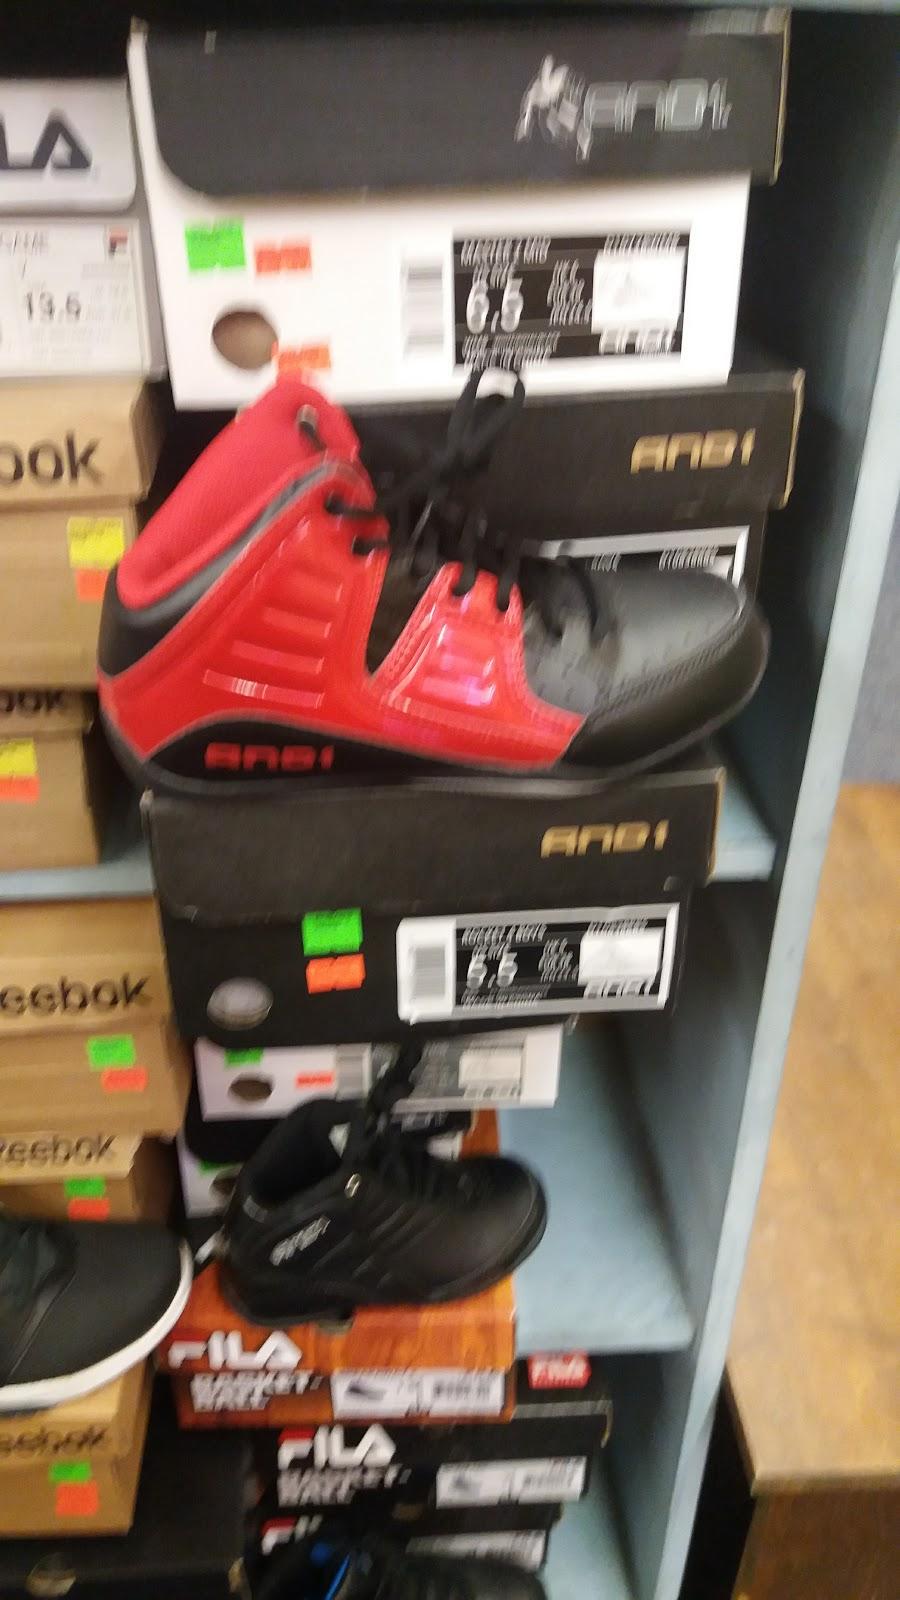 Rogans Shoes - shoe store  | Photo 7 of 10 | Address: 649 S Taylor Dr, Sheboygan, WI 53081, USA | Phone: (920) 451-0188